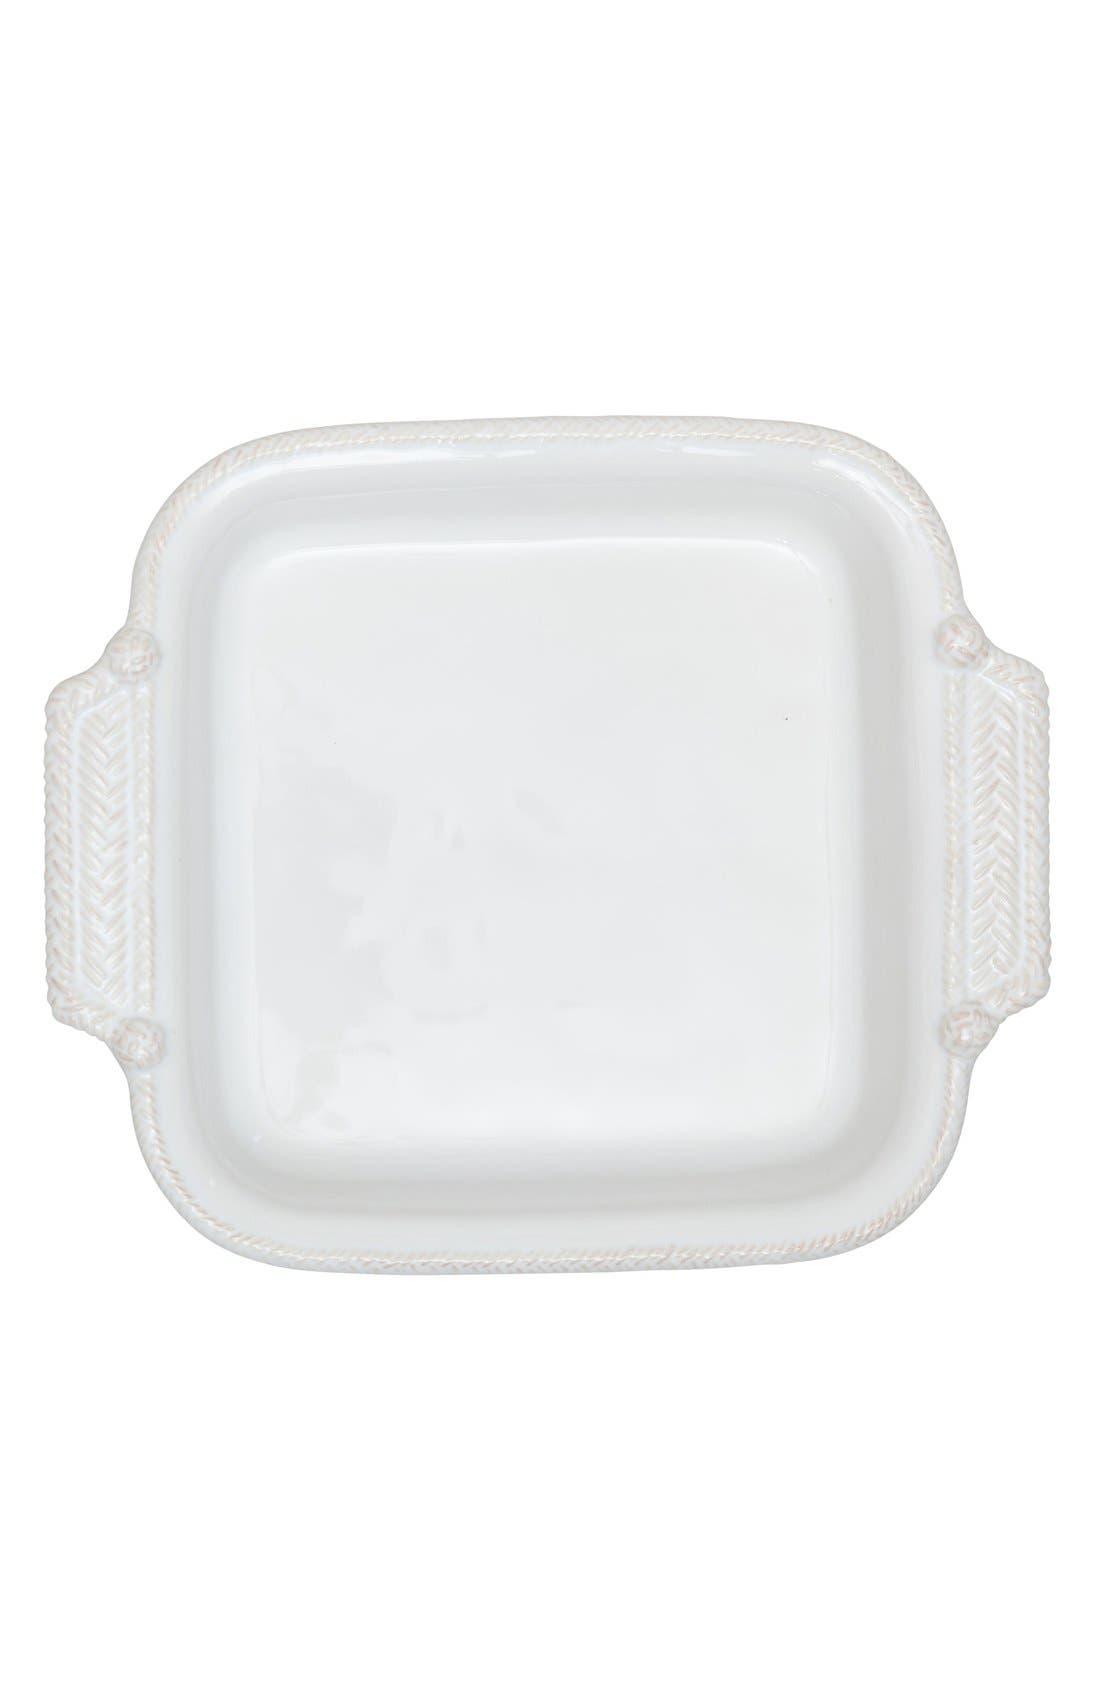 Le Panier 2-Quart Square Baking Dish,                         Main,                         color, White